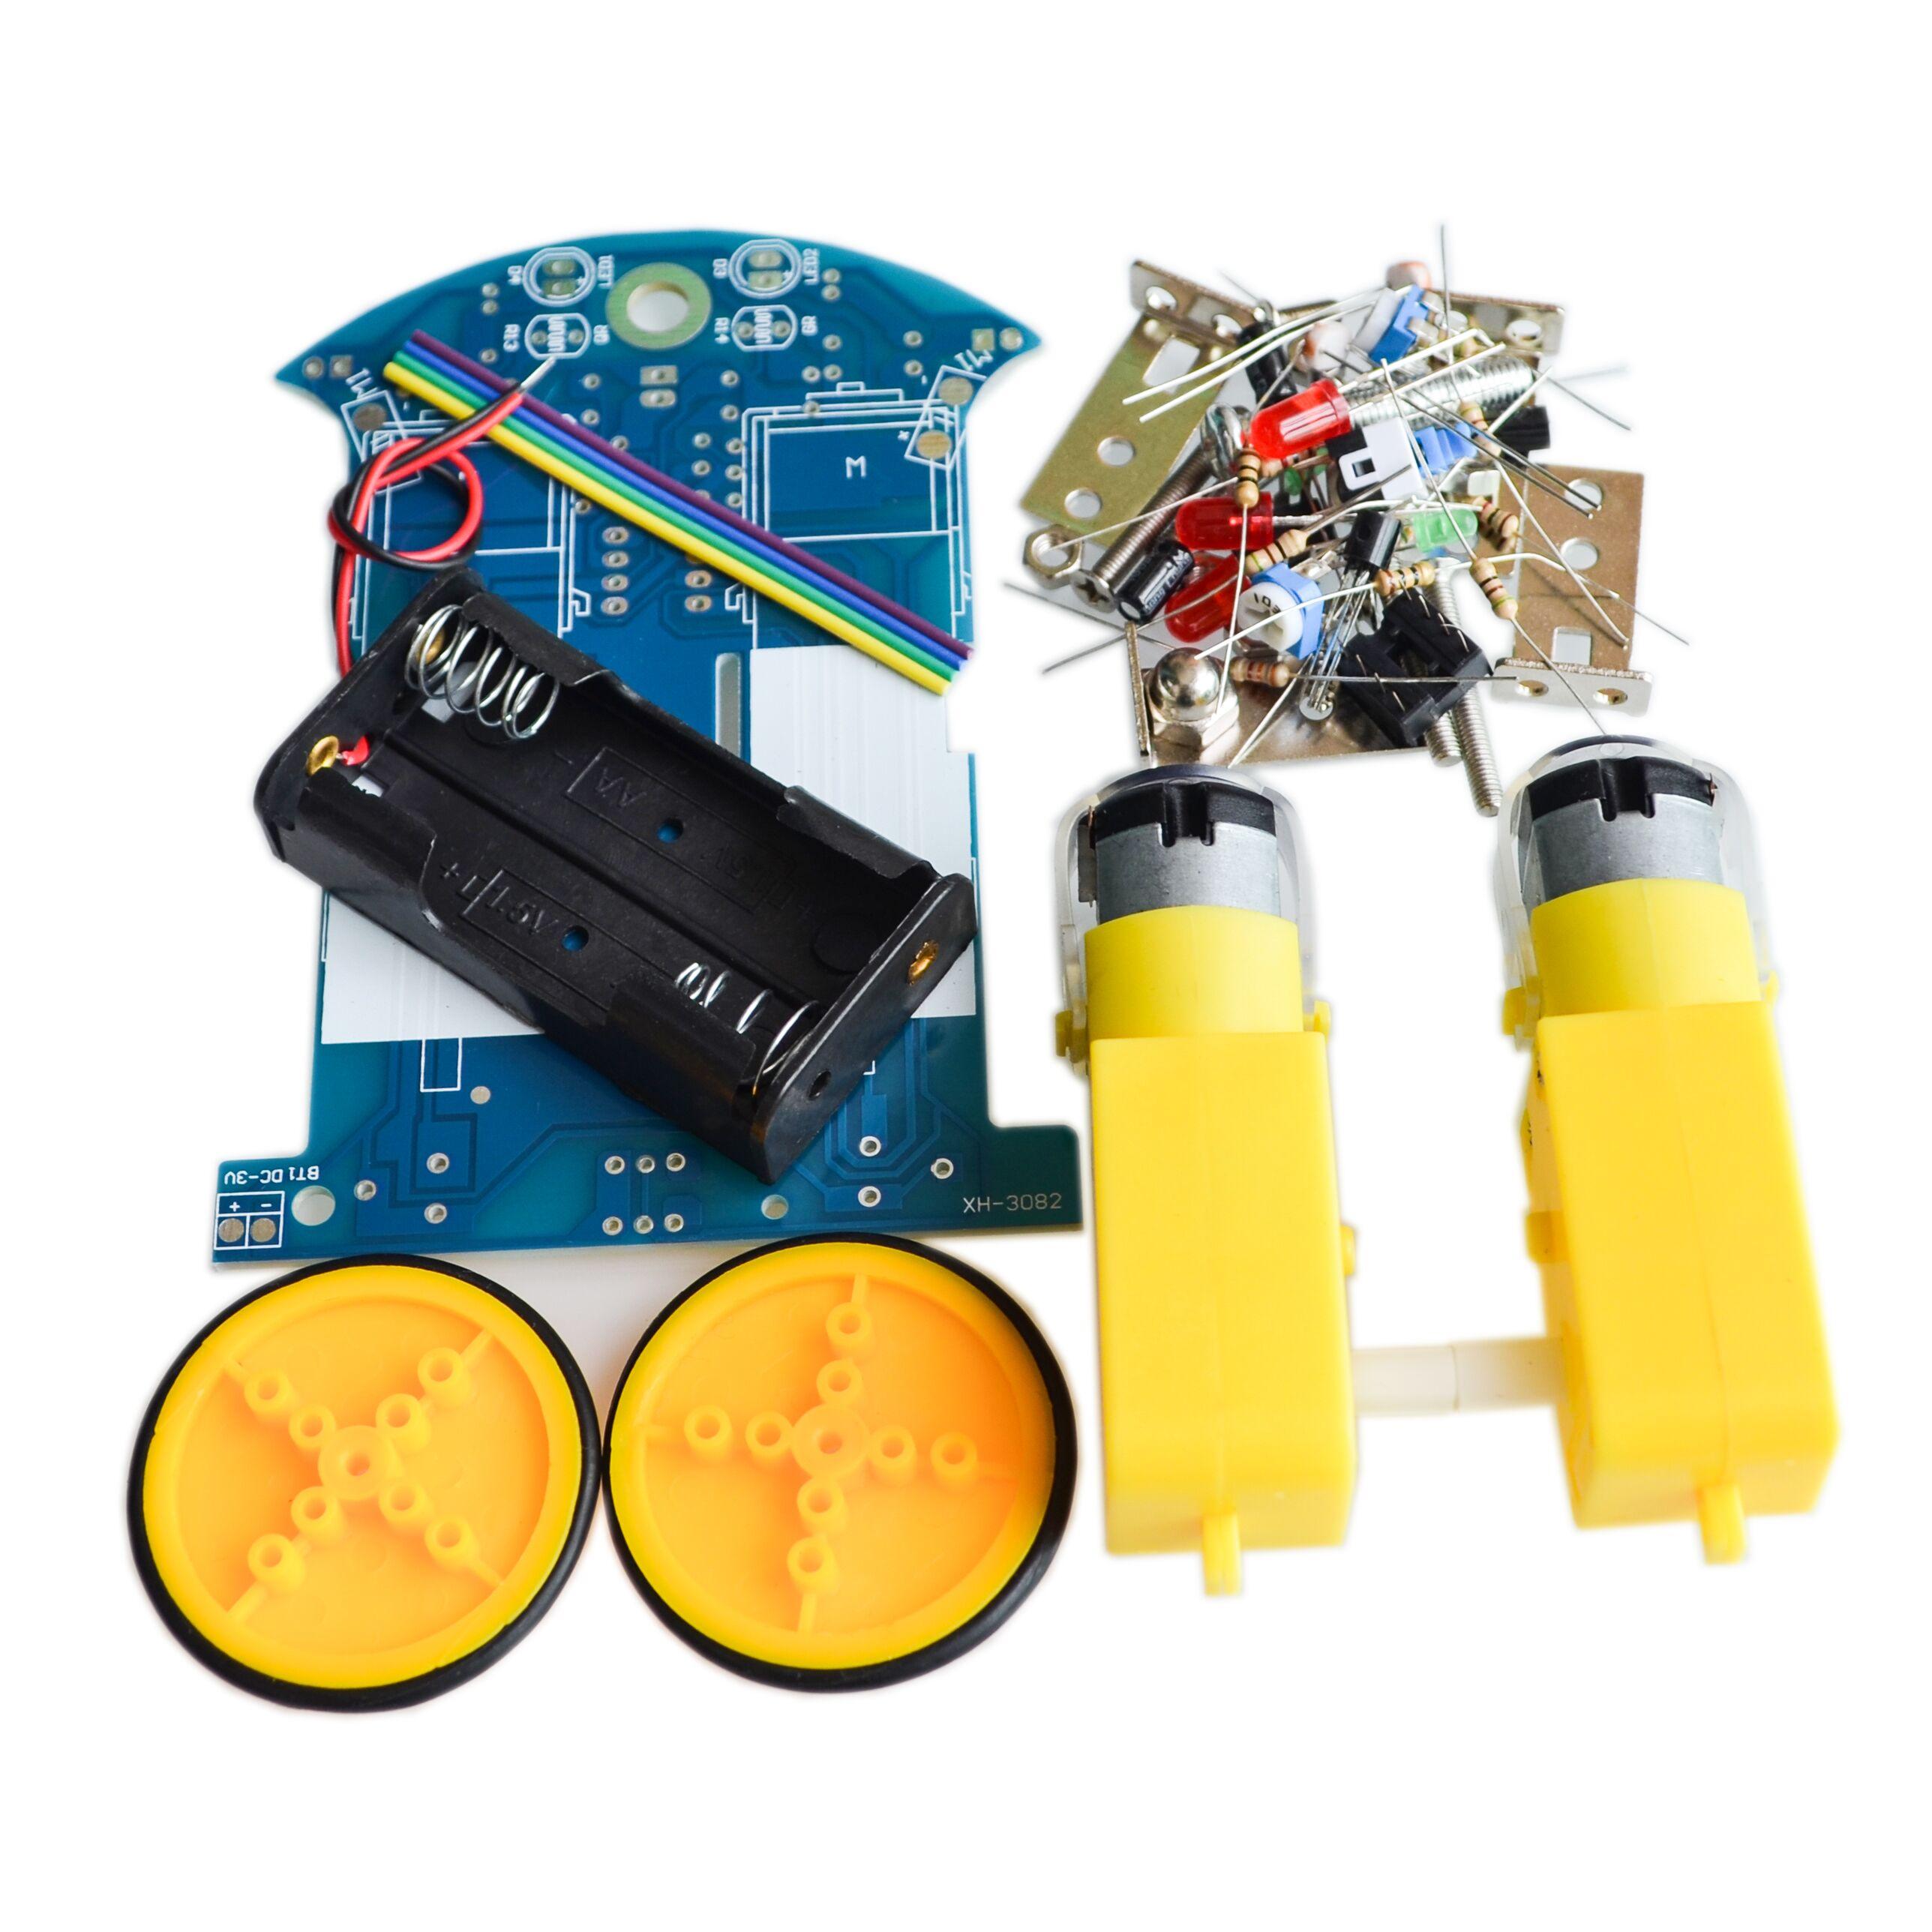 D2-1 diy kit Intelligent tracking the car kit D2-1 patrol car parts Electronic manufacture DIY smart car diy electronic suite